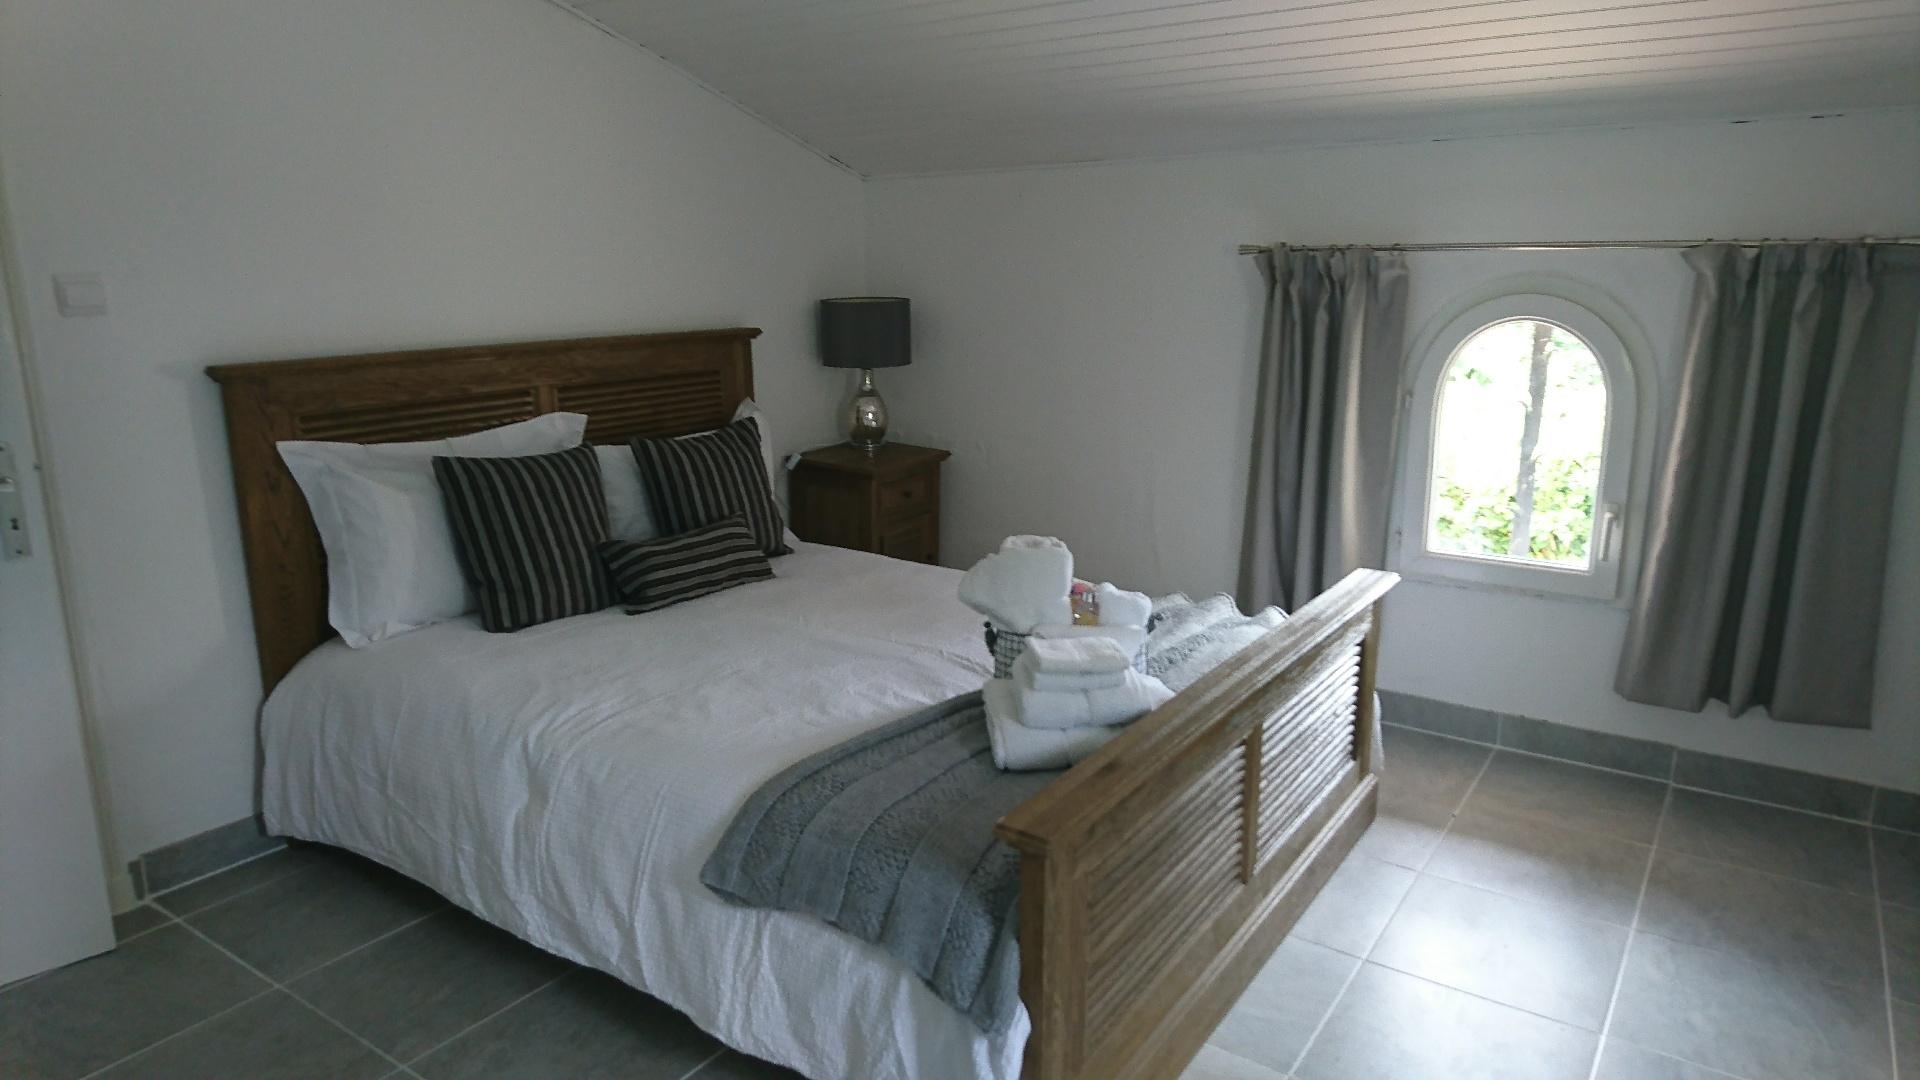 Cannes Bedroom